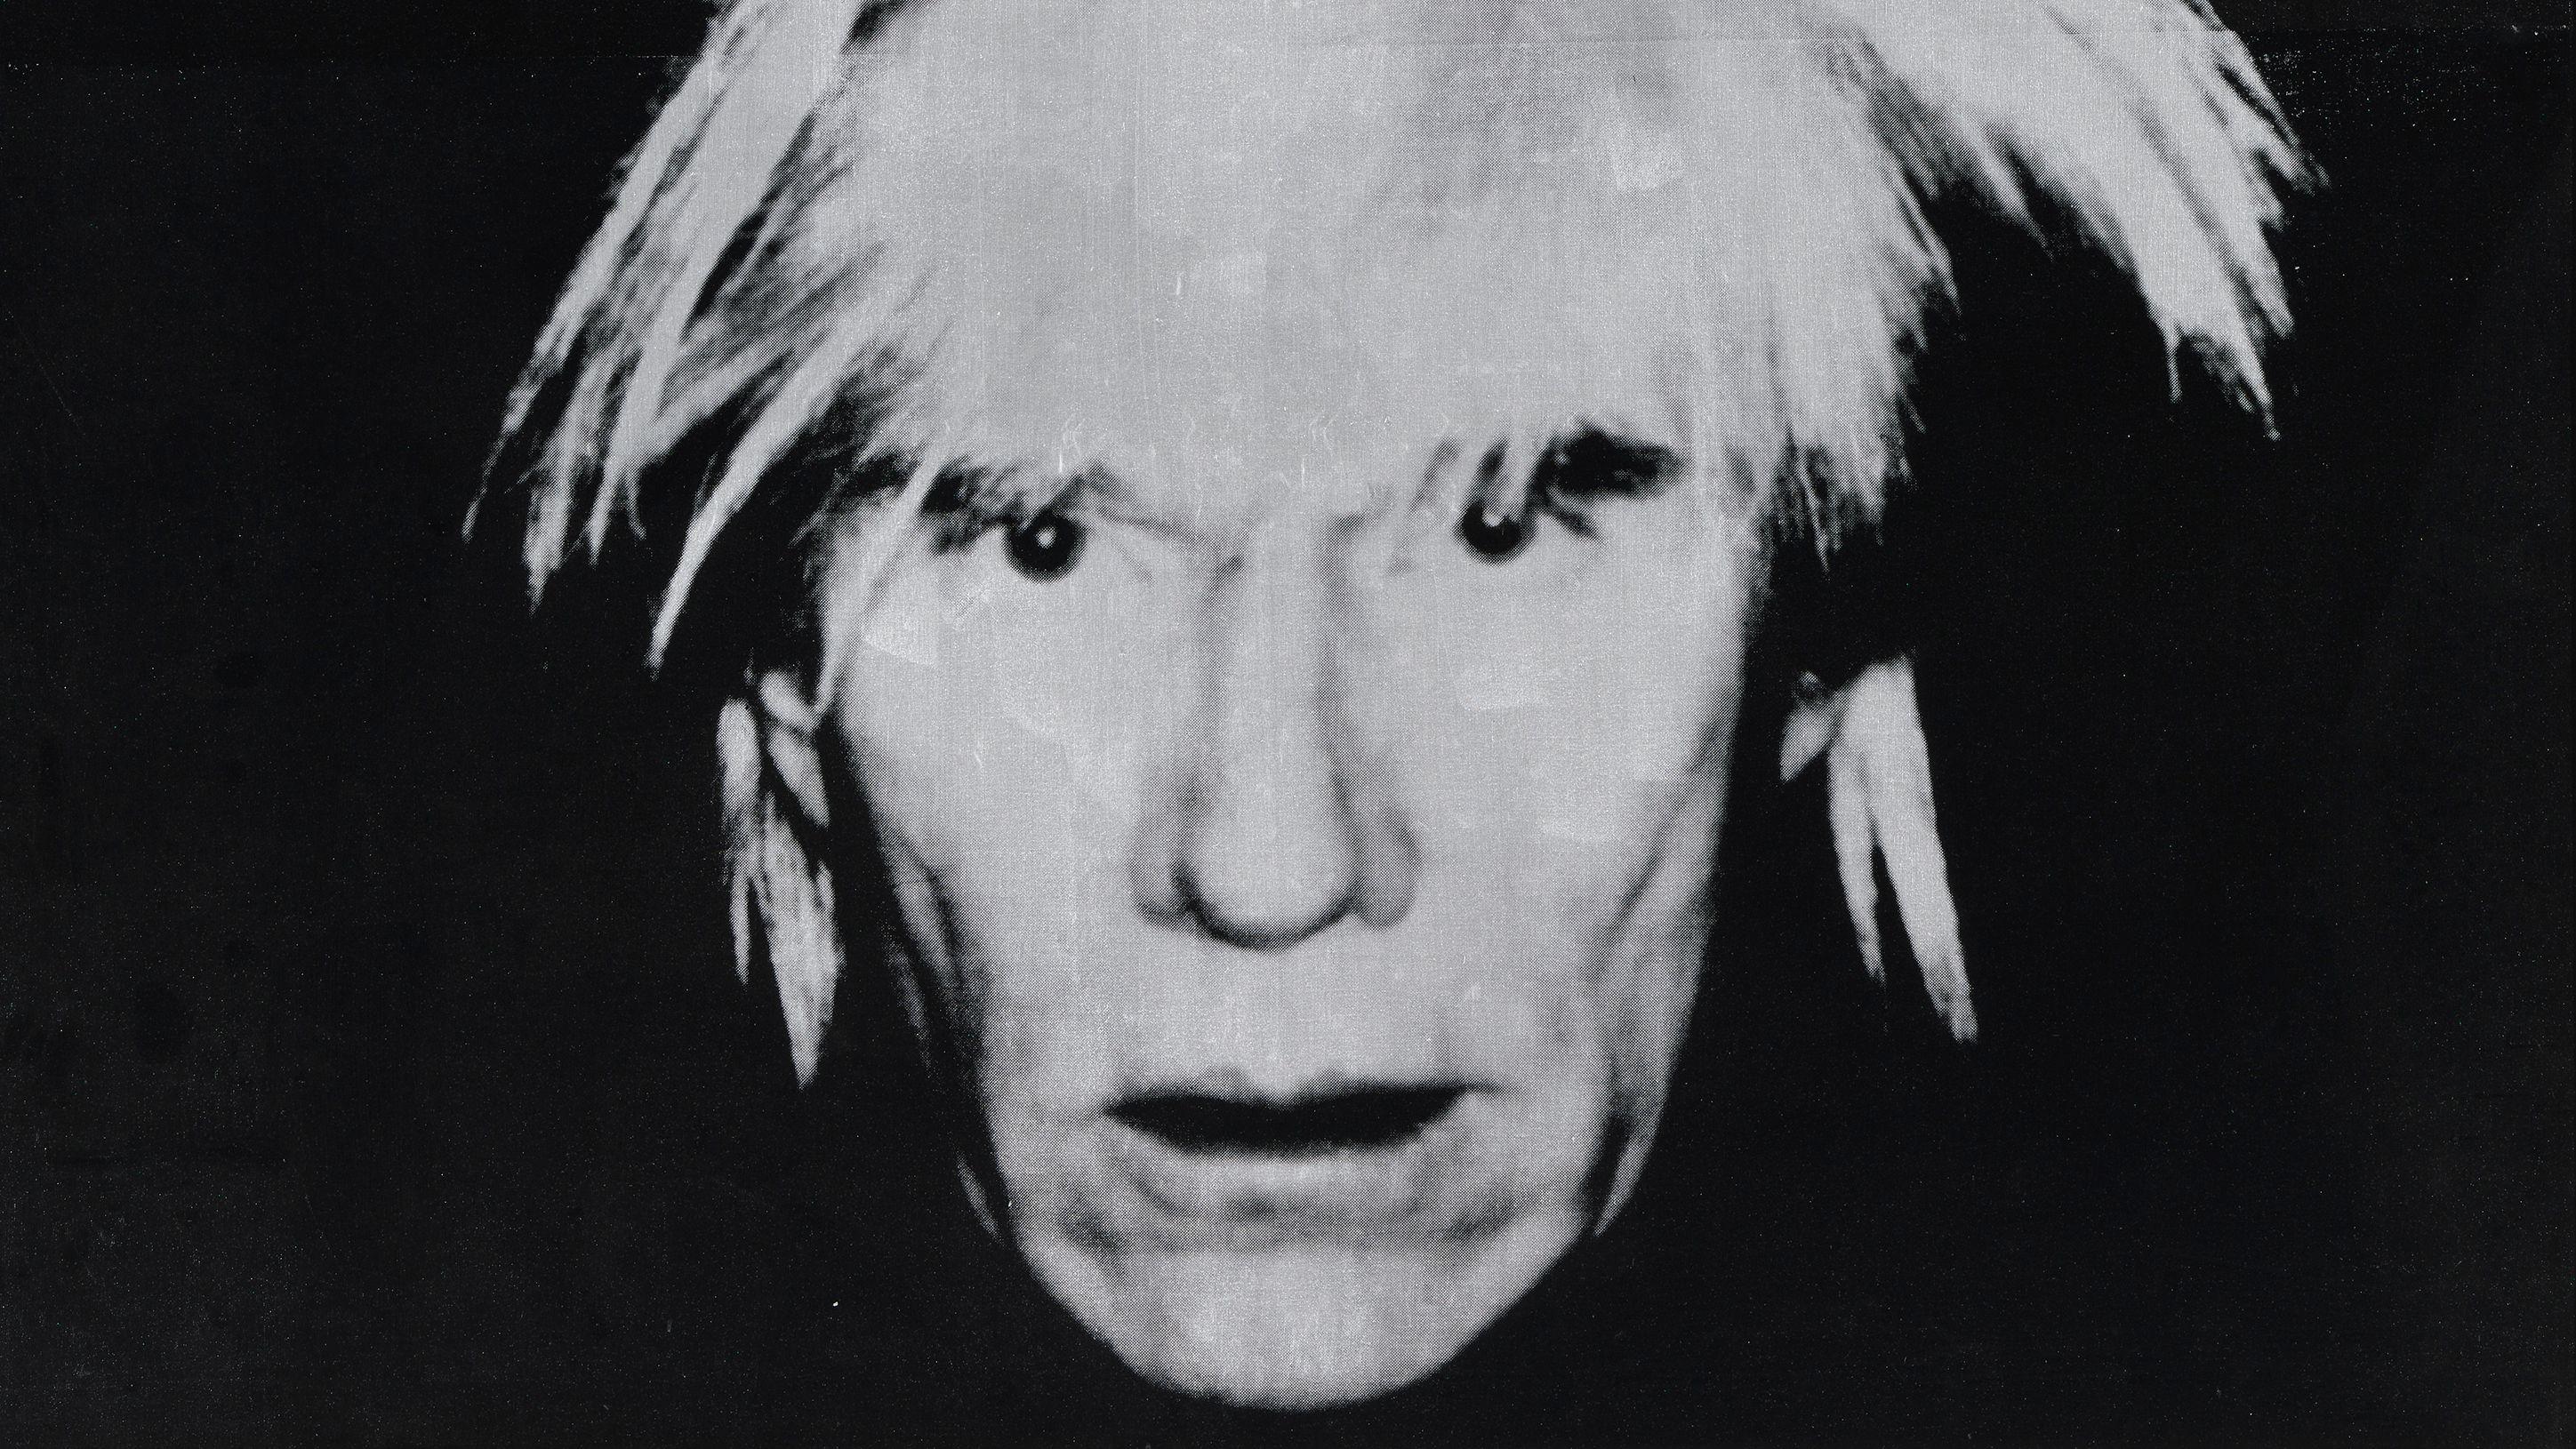 Andy Warhol: Selbstporträt, 1986